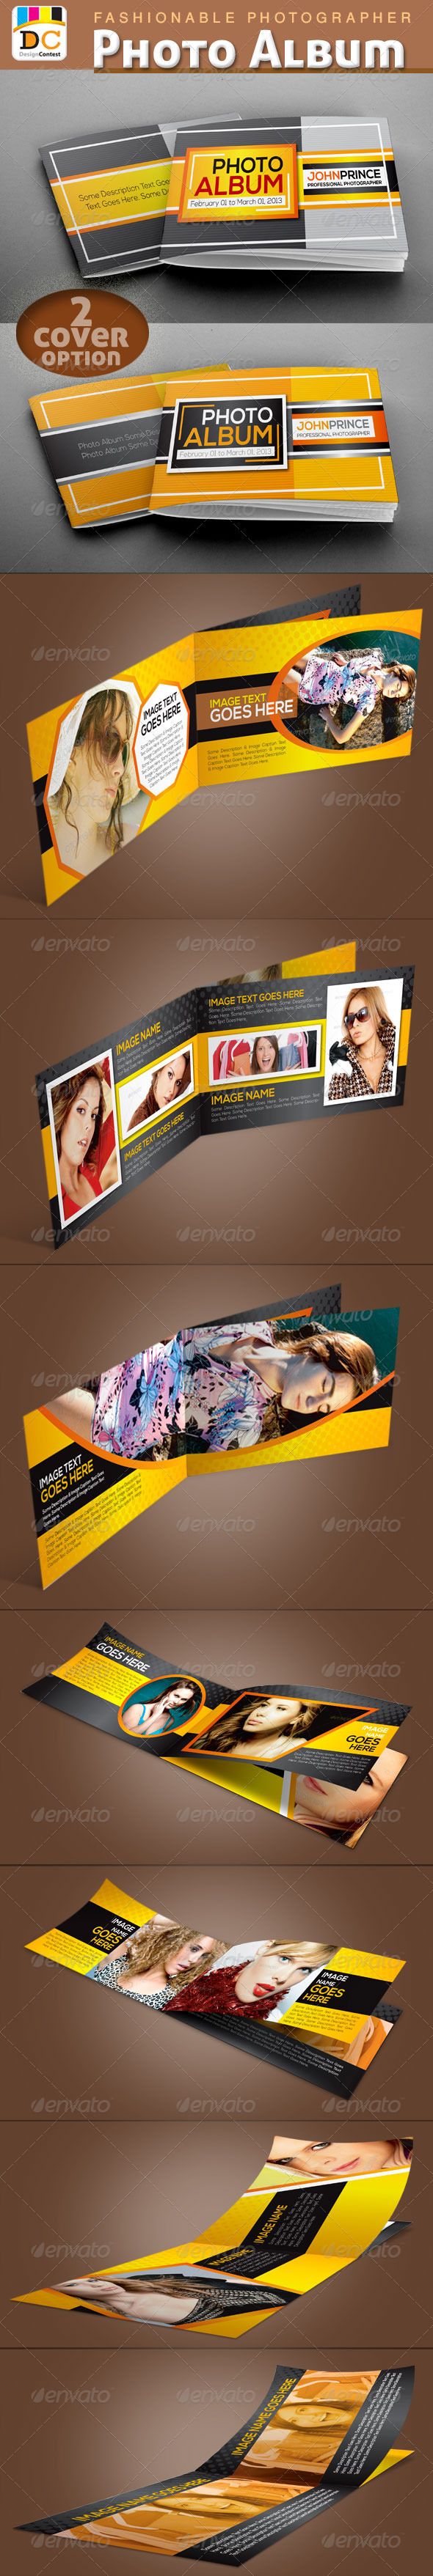 GraphicRiver Fashionable Photographer Photo Album 4401505